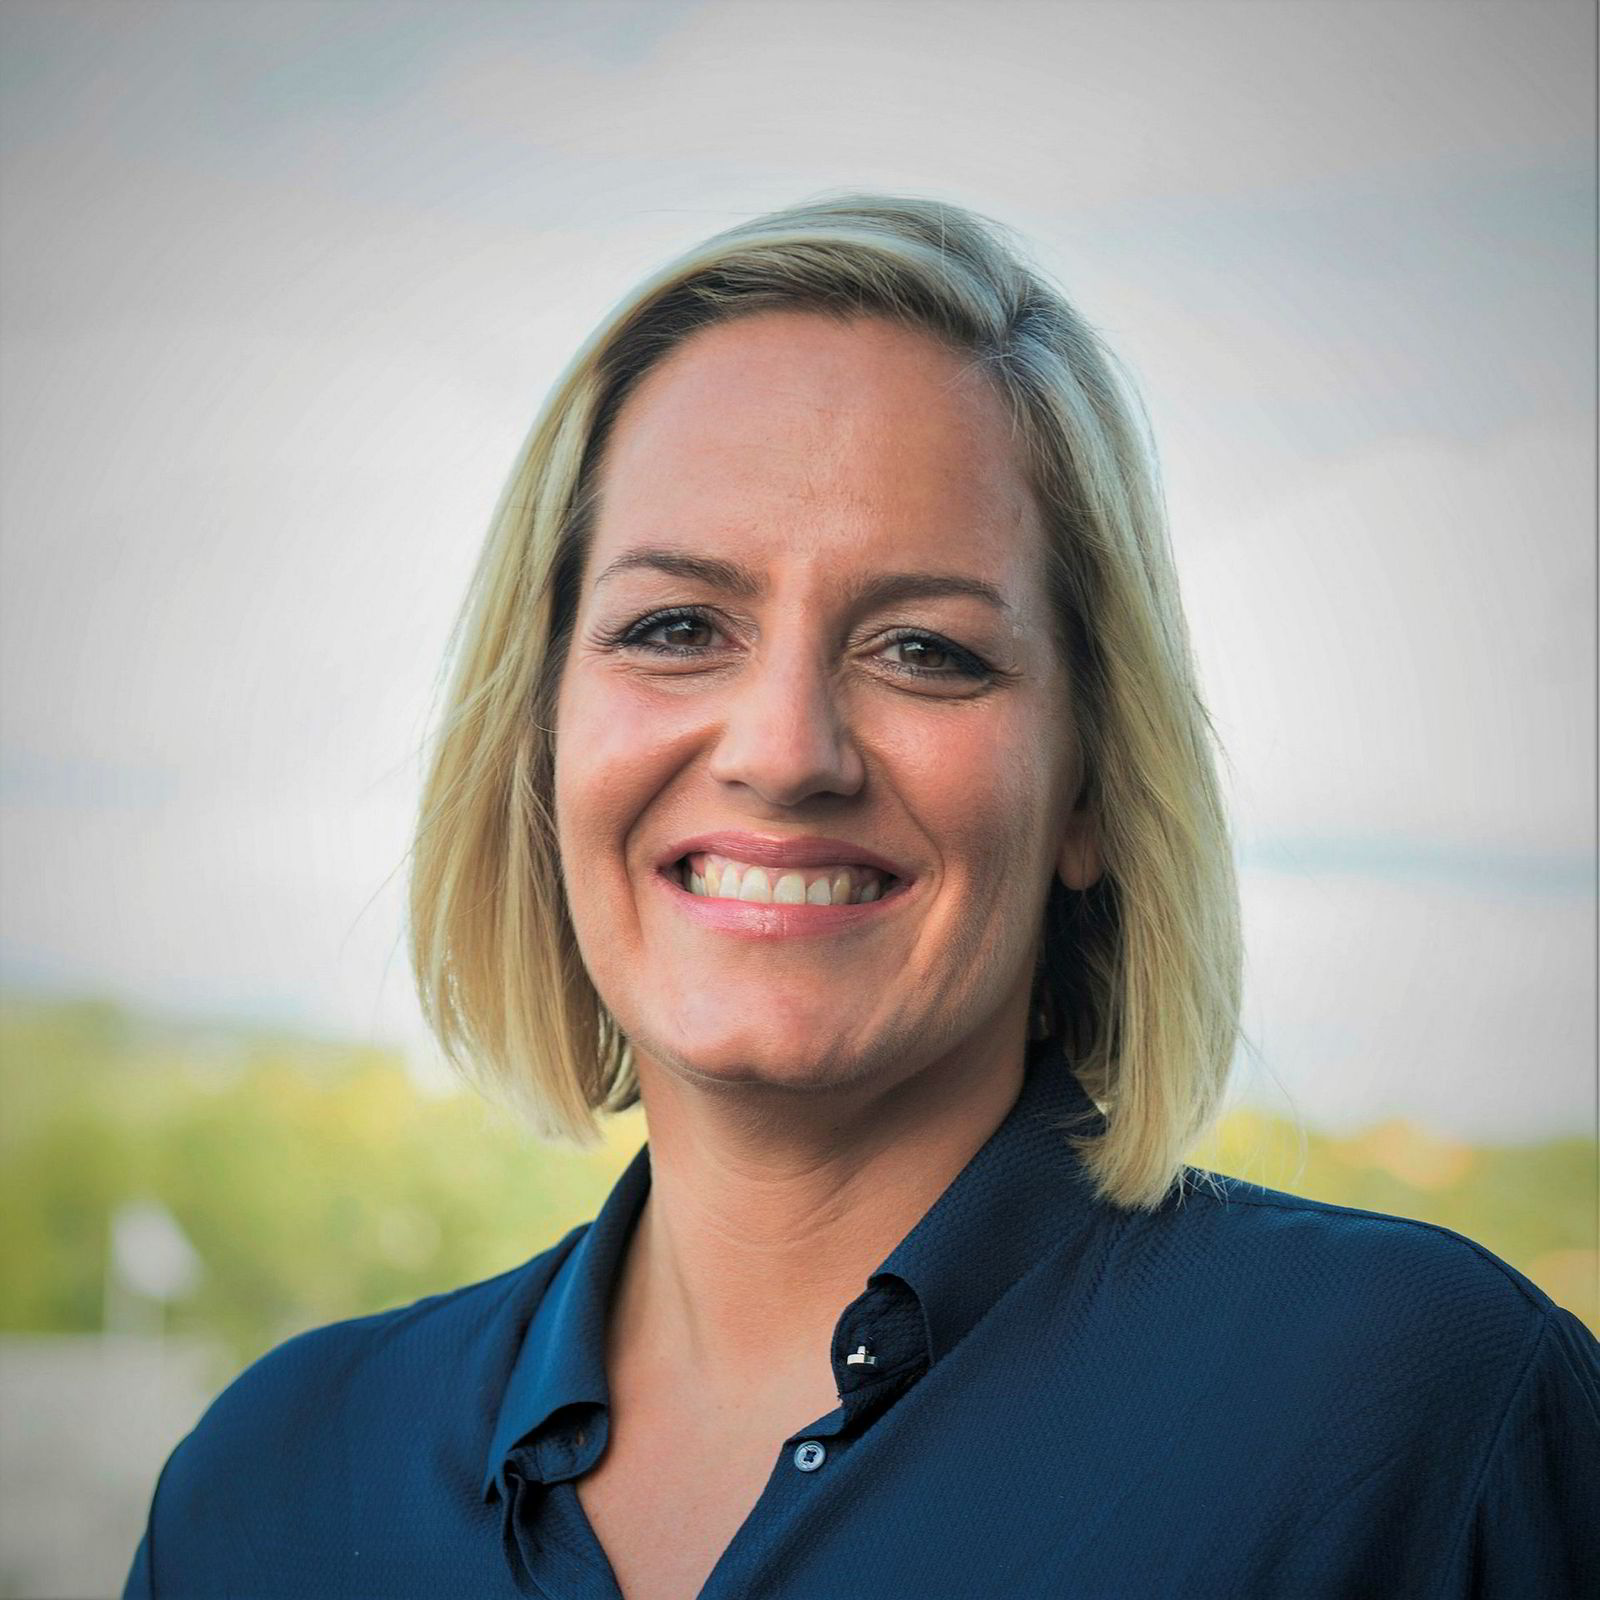 Maria Grimstad de Perlinghi er merkevaredirektør i gründerfabrikken Norselab.